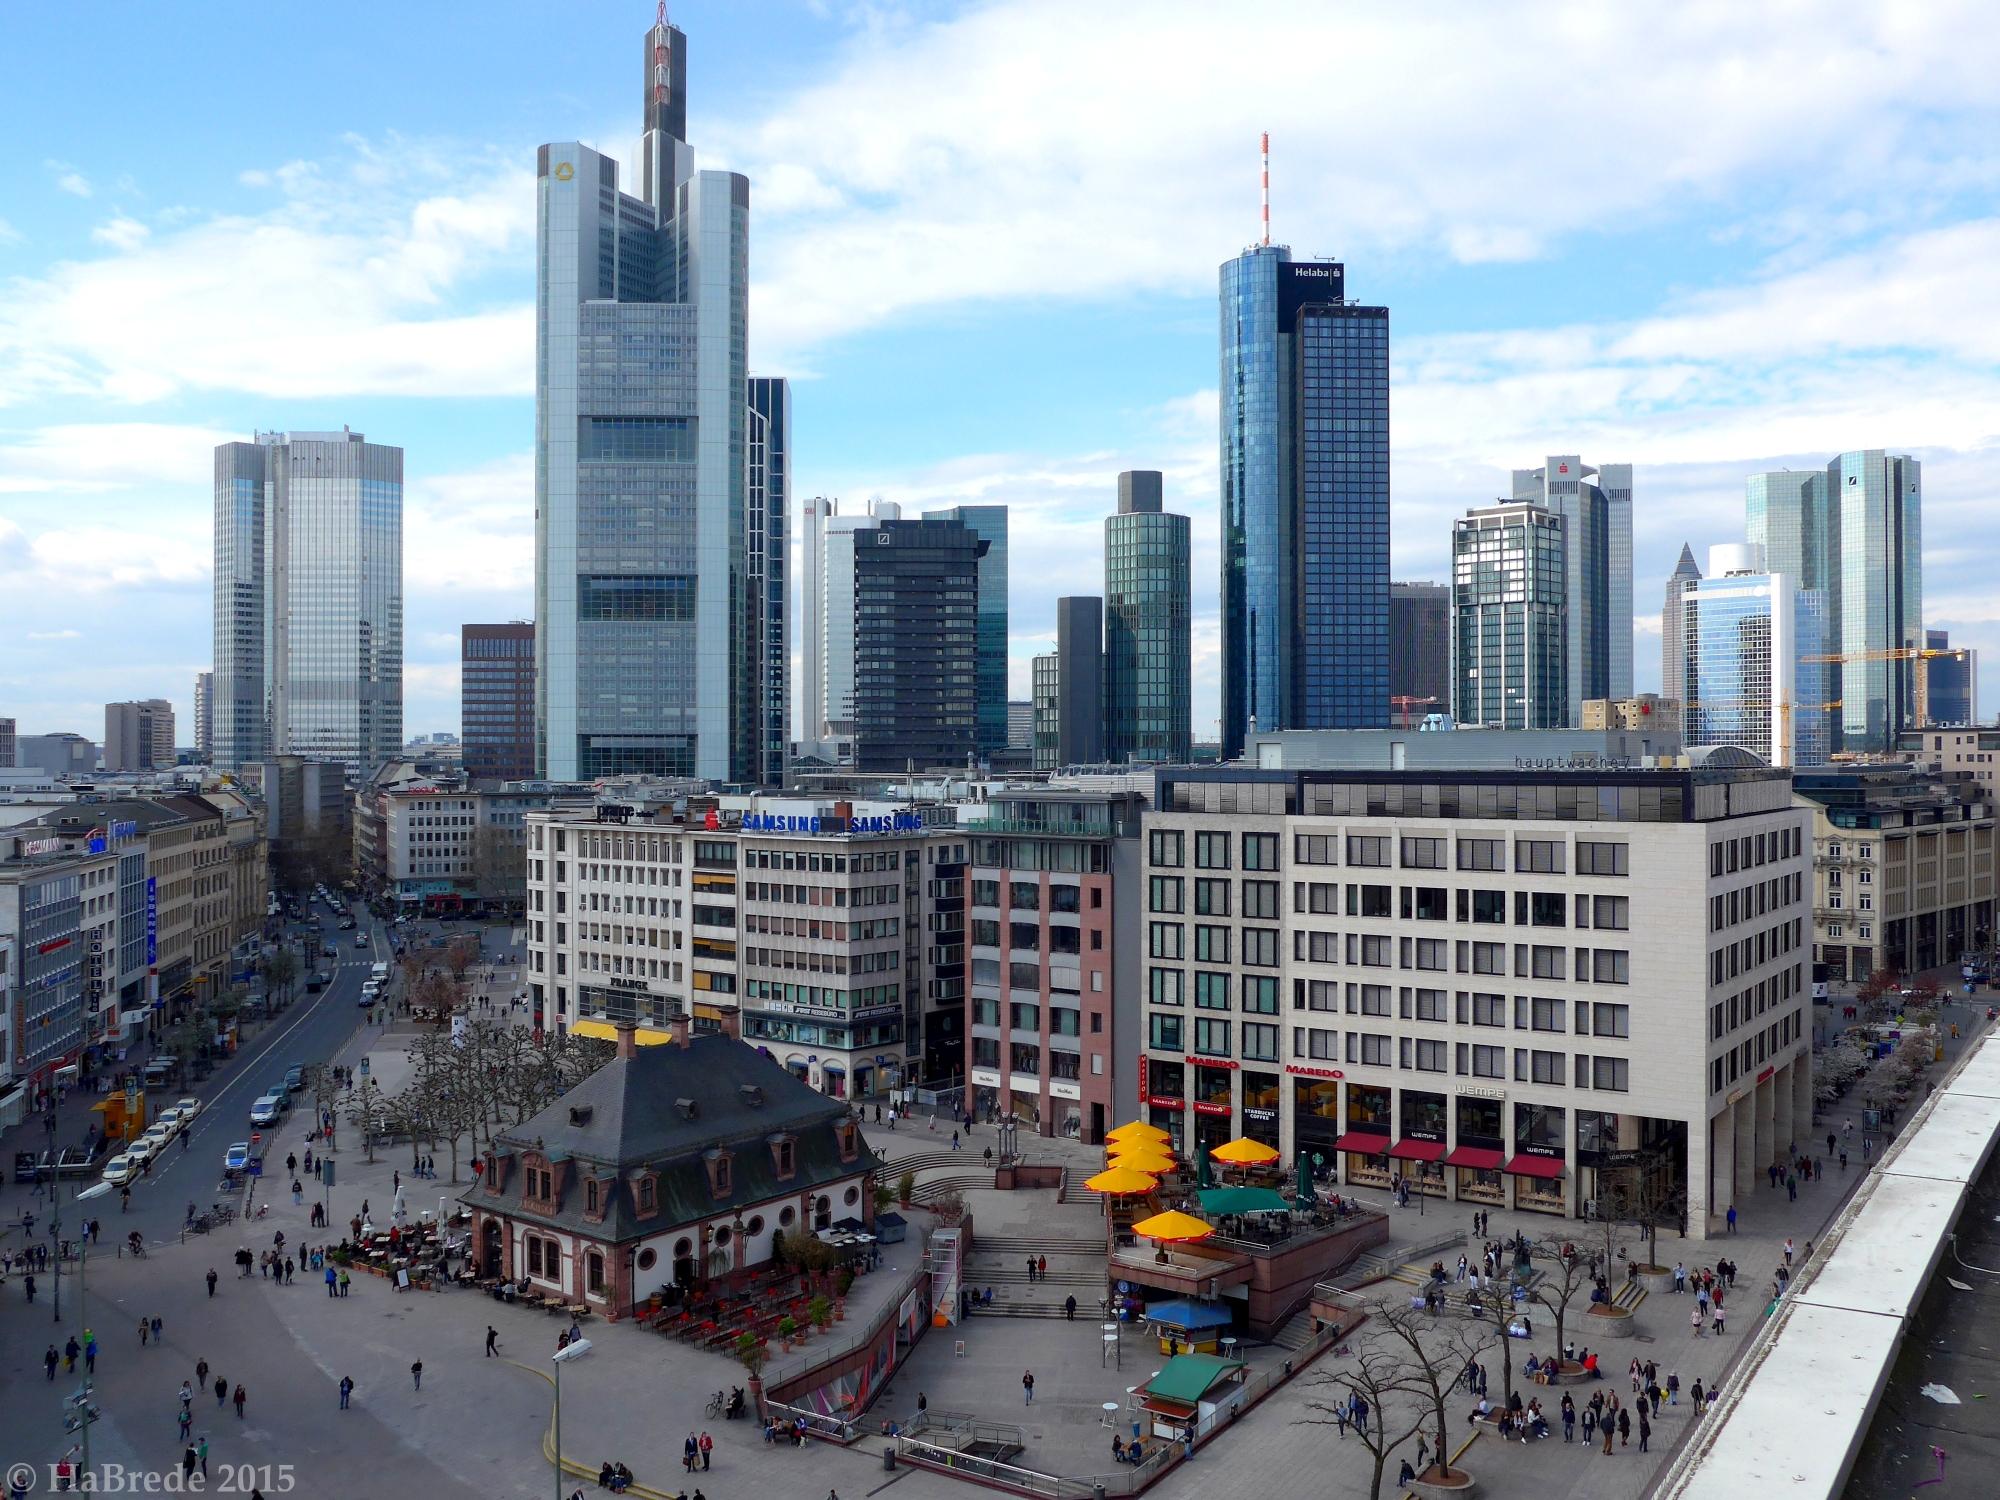 The Skyline of Frankfurt/M City, Germany